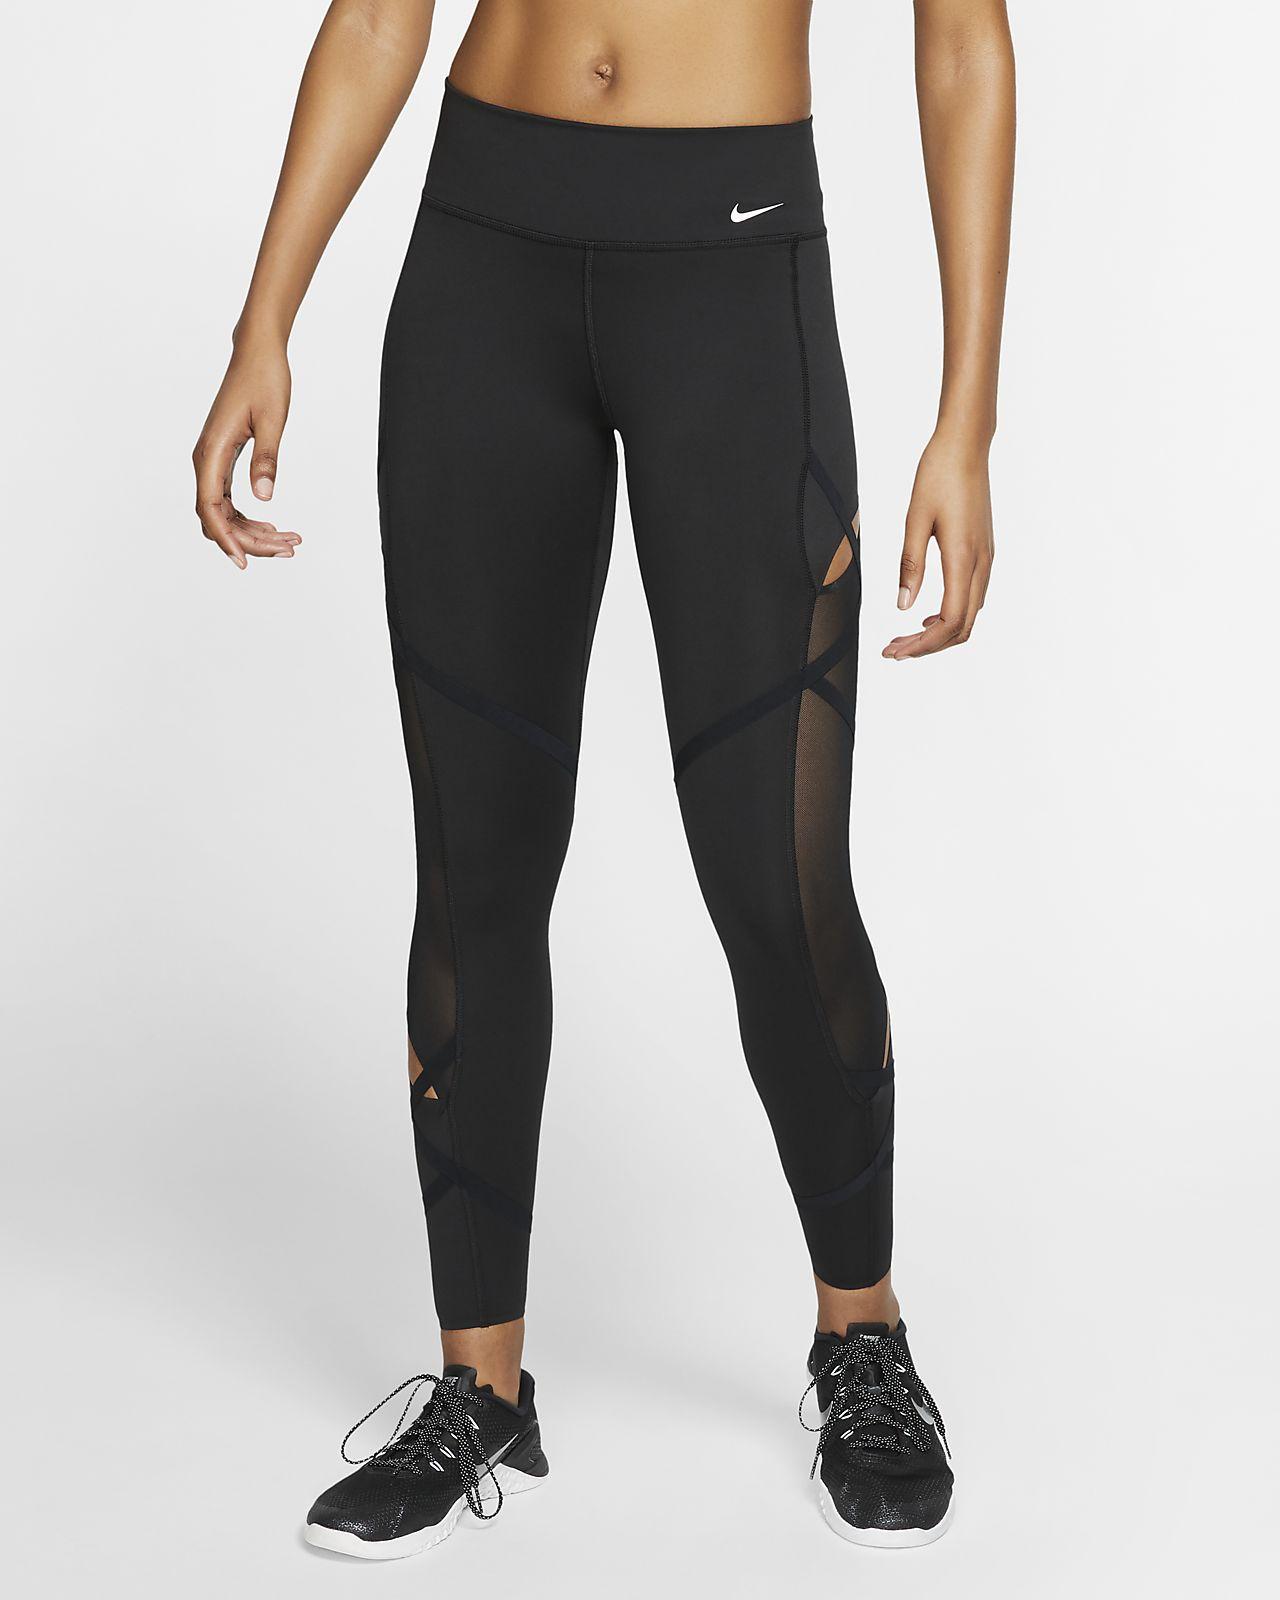 Nike One Icon Clash Women's 7/8 Leggings